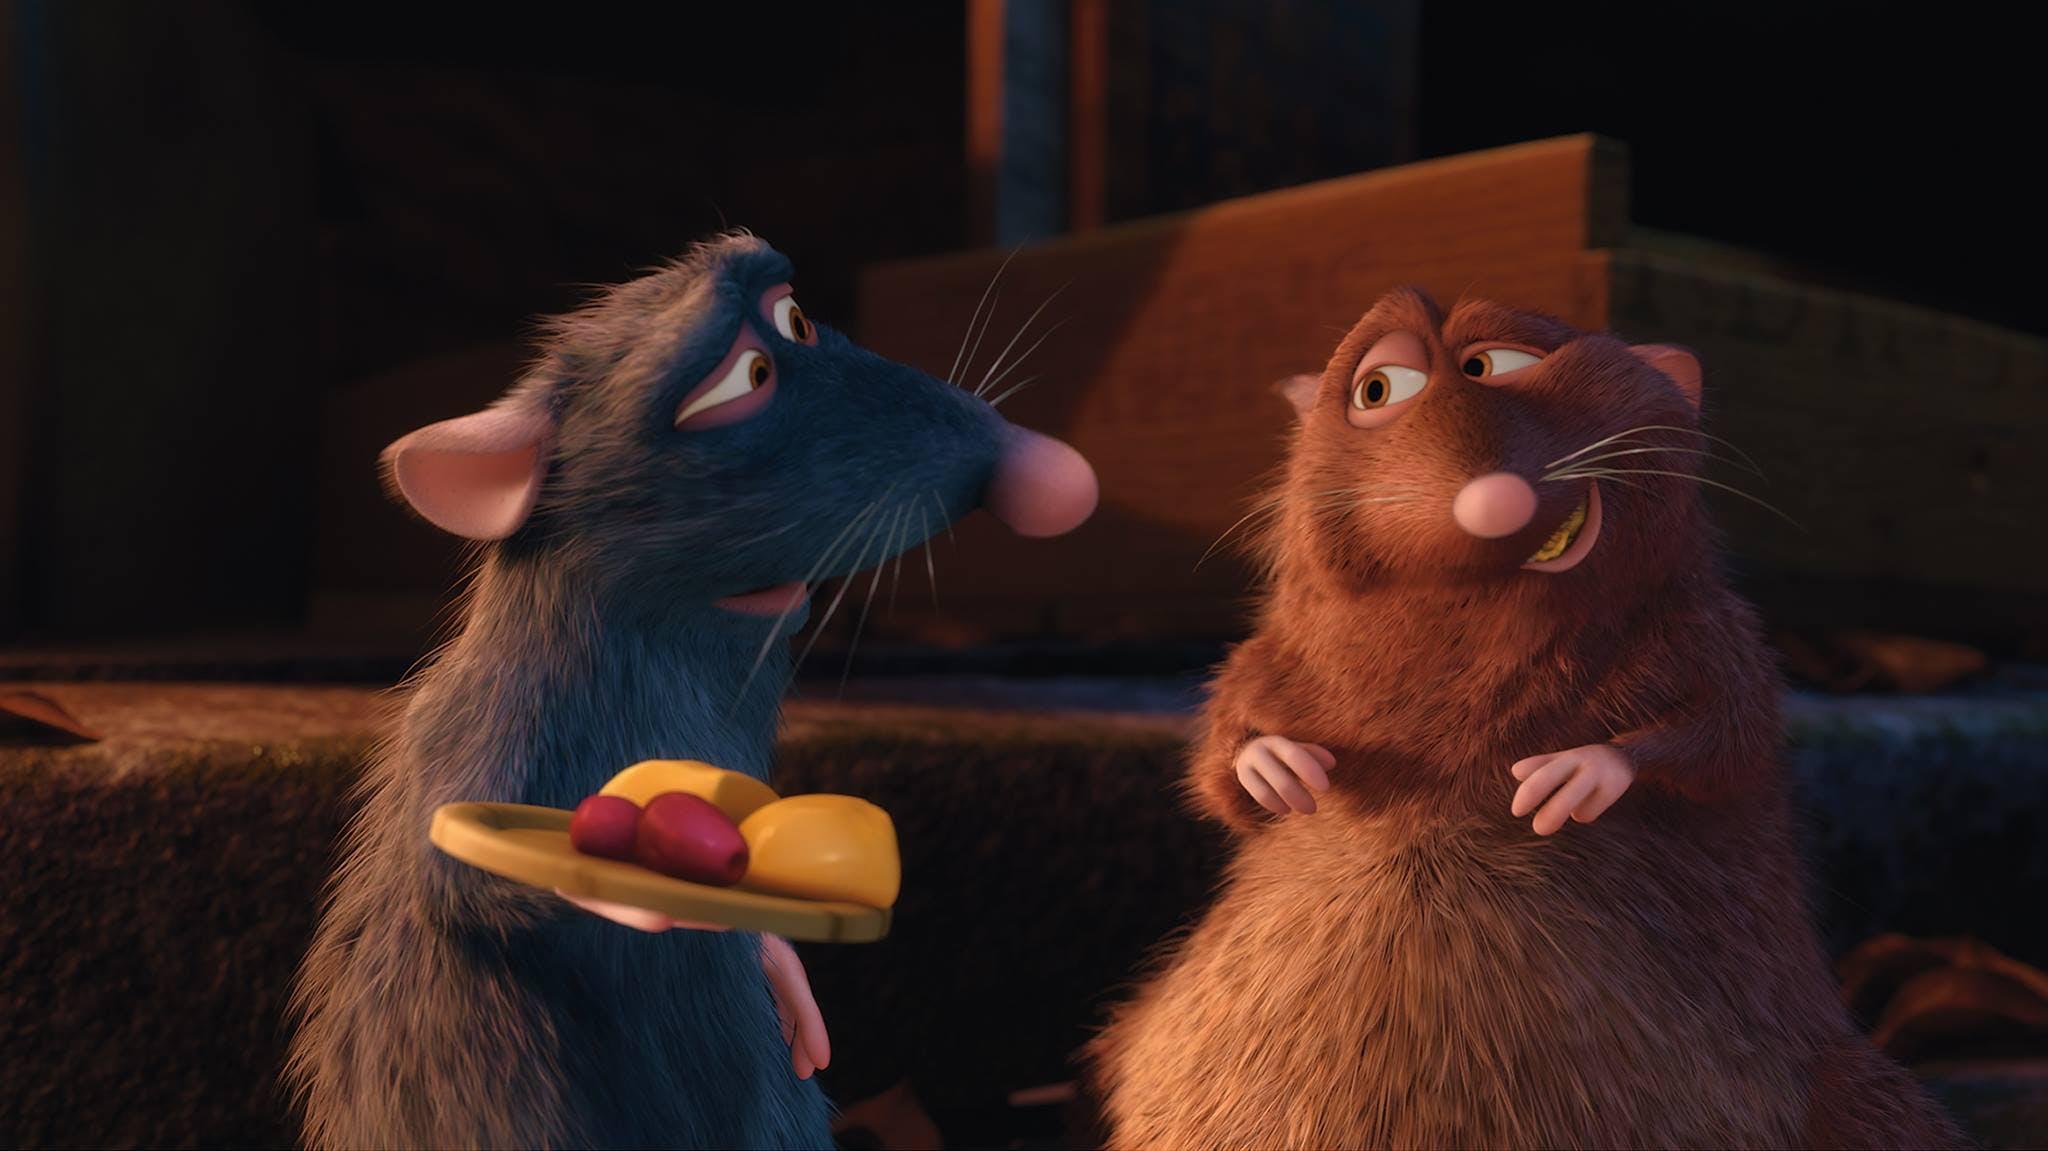 pixar company : ratatouille